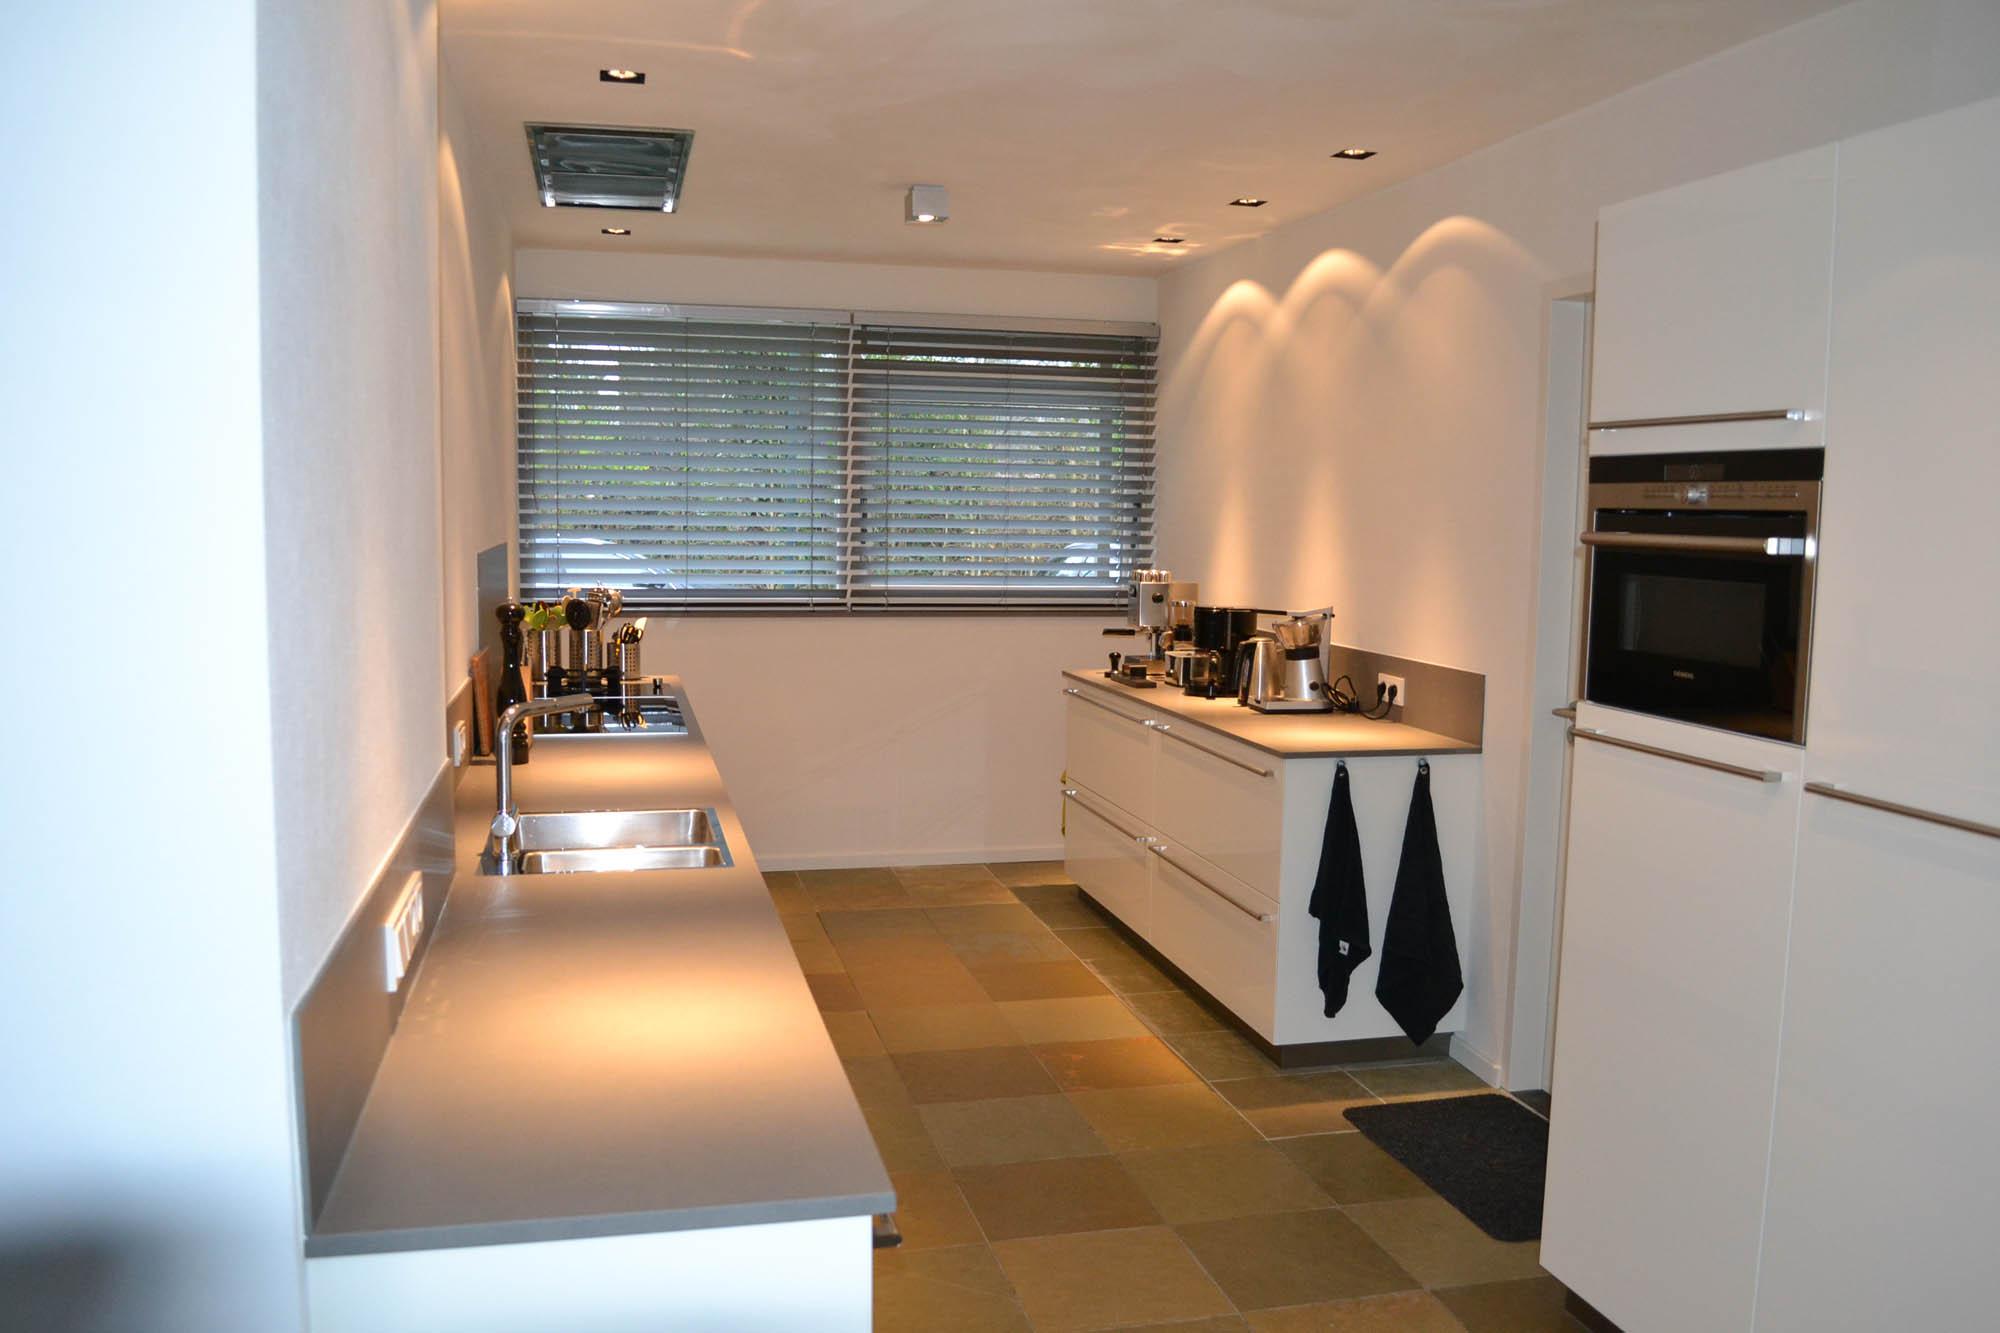 Keuken hoogglans wit met keramiek blad pdi interieurbouw - Moderne apparaten ...